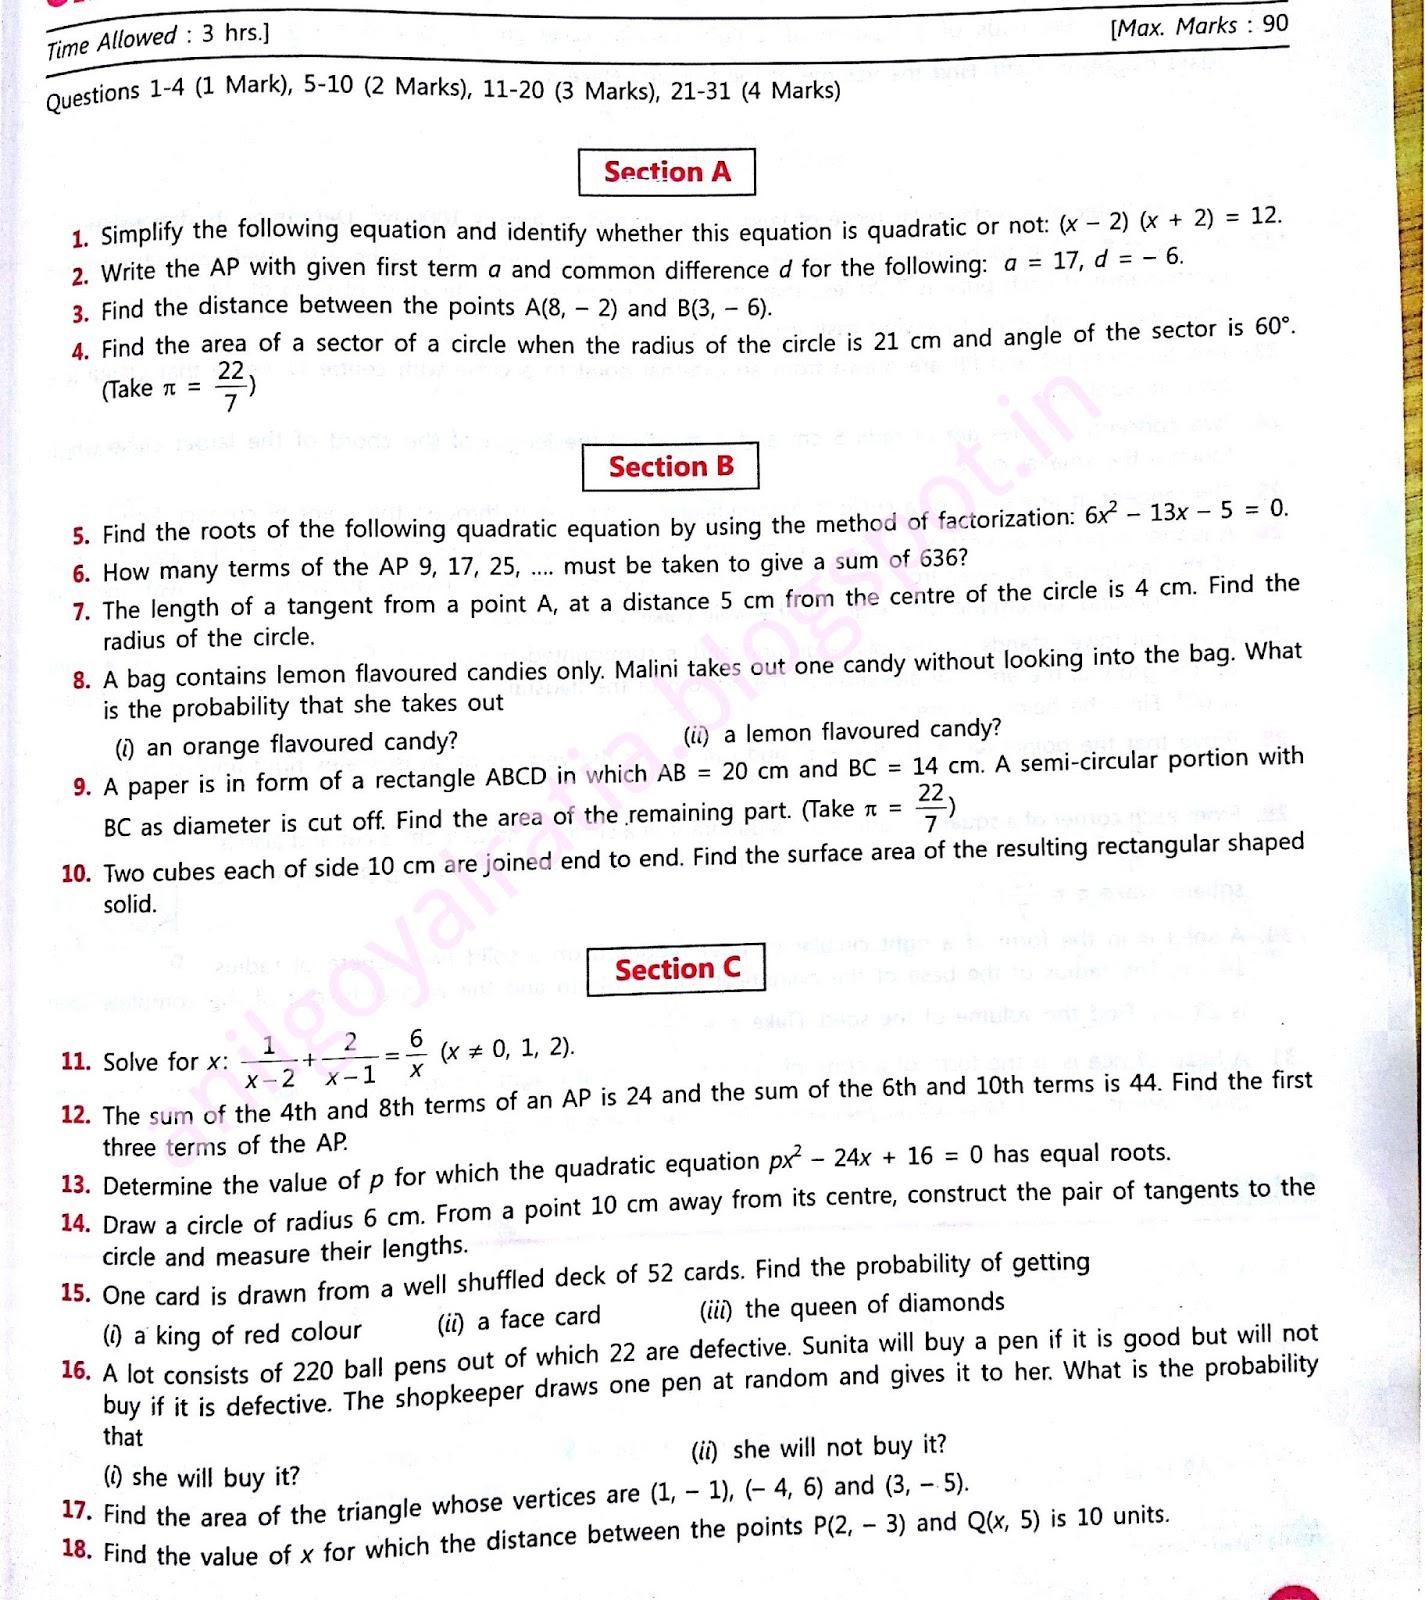 ofw bagong bayani essay